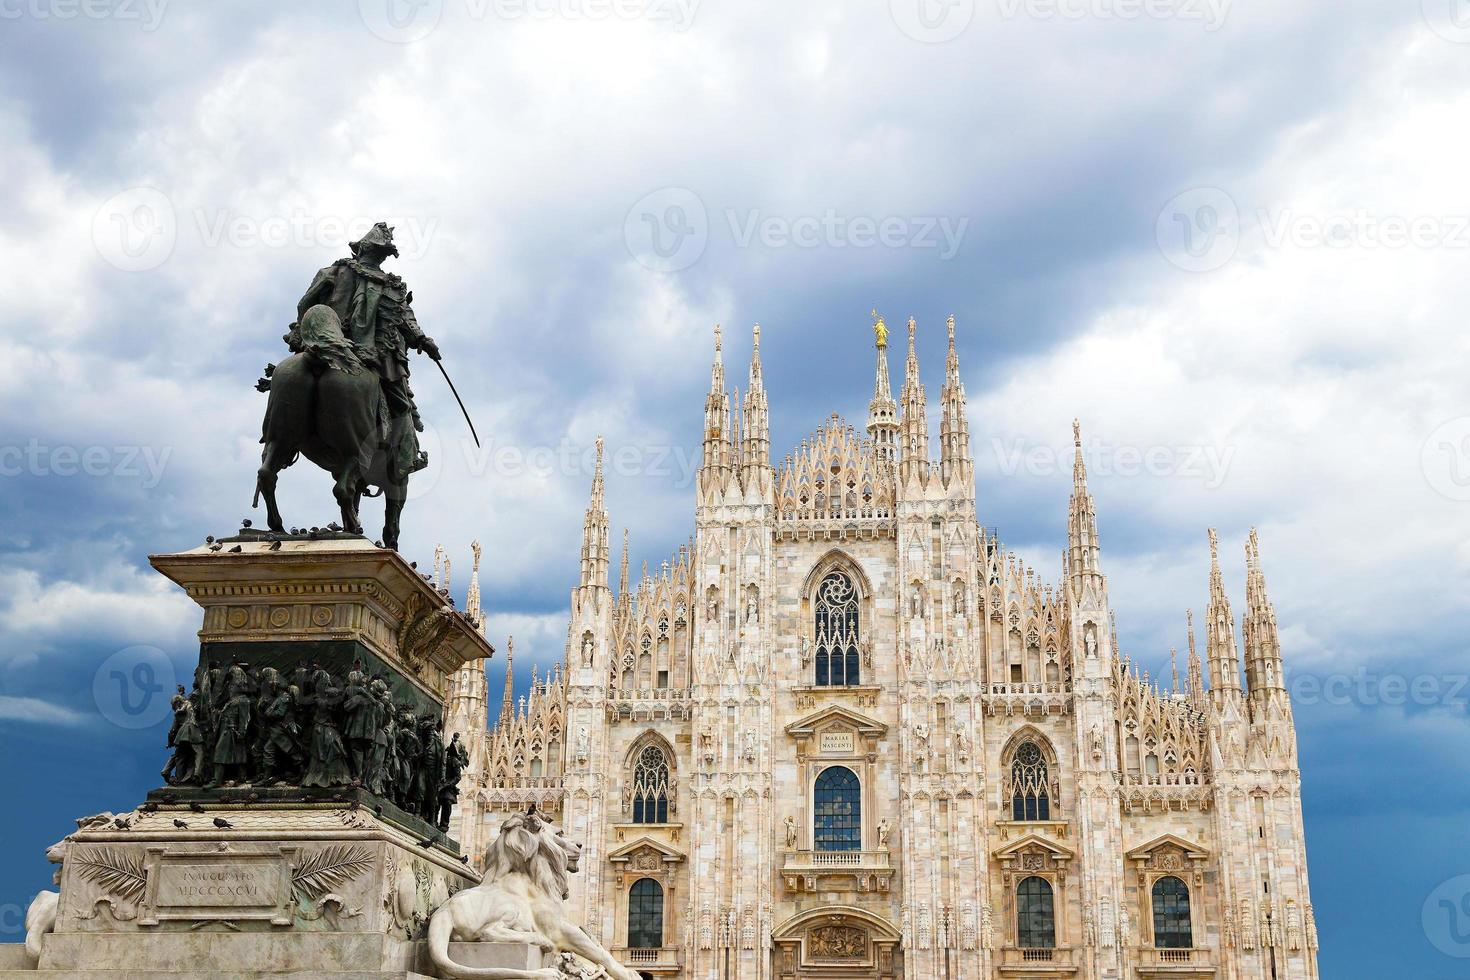 Dôme de la cathédrale de Milan avec statue de Vittorio Emanuele II photo